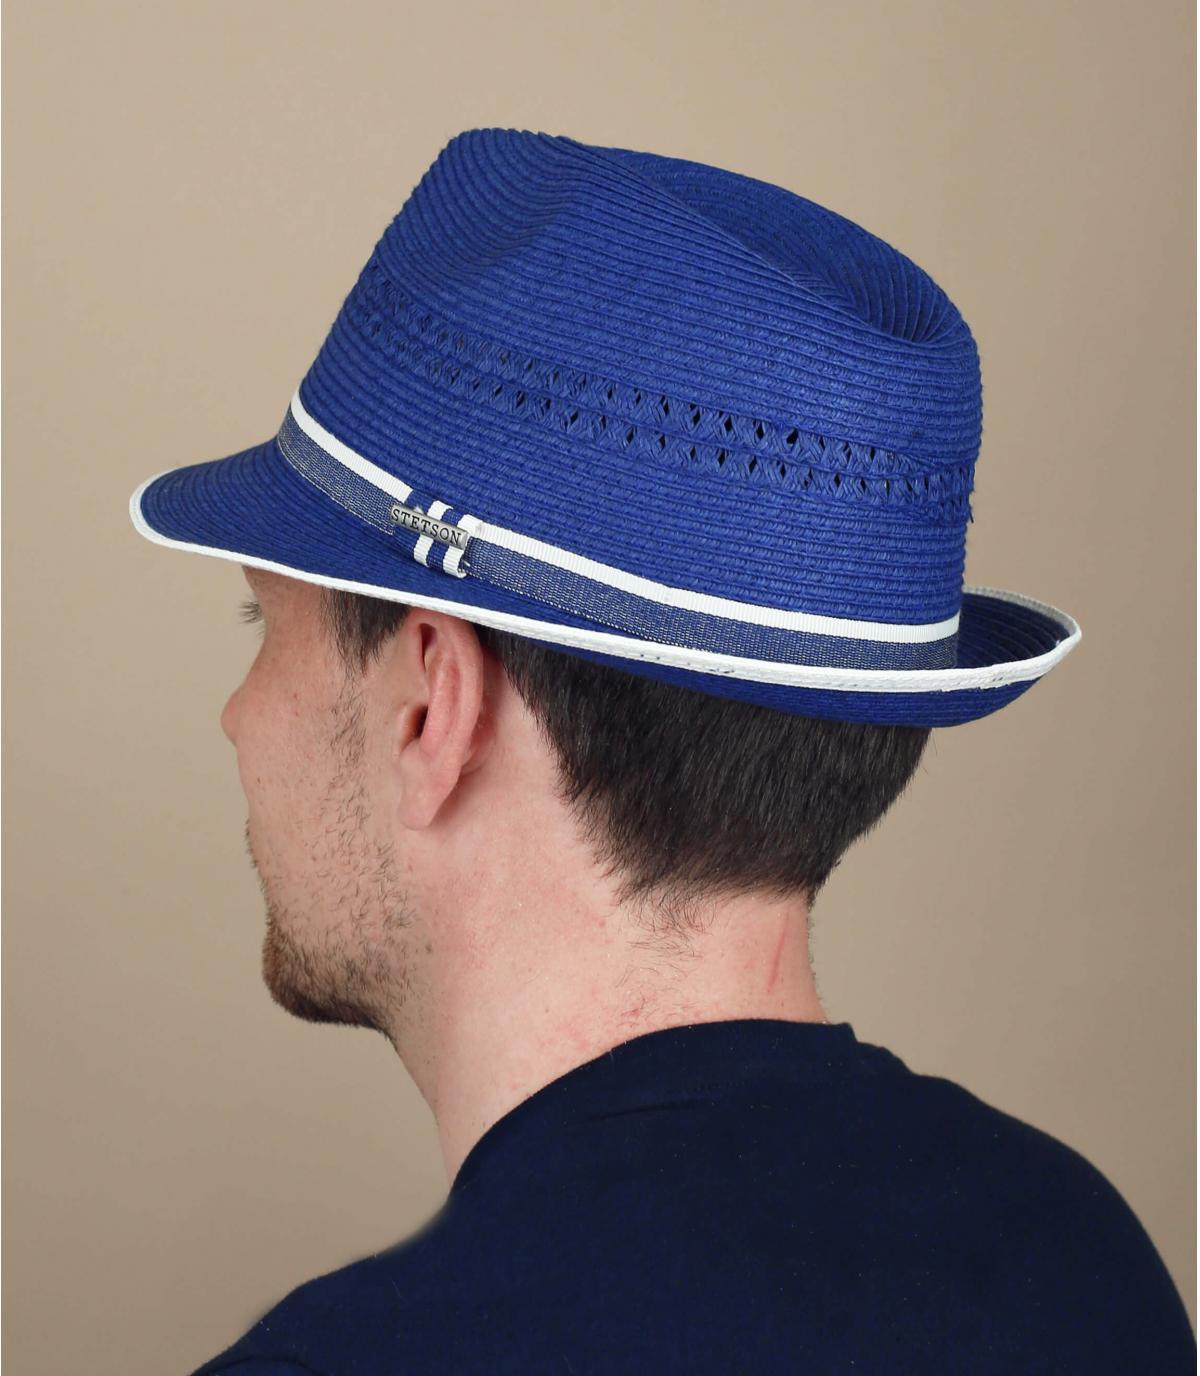 Trilby Strohhut blau Stetson